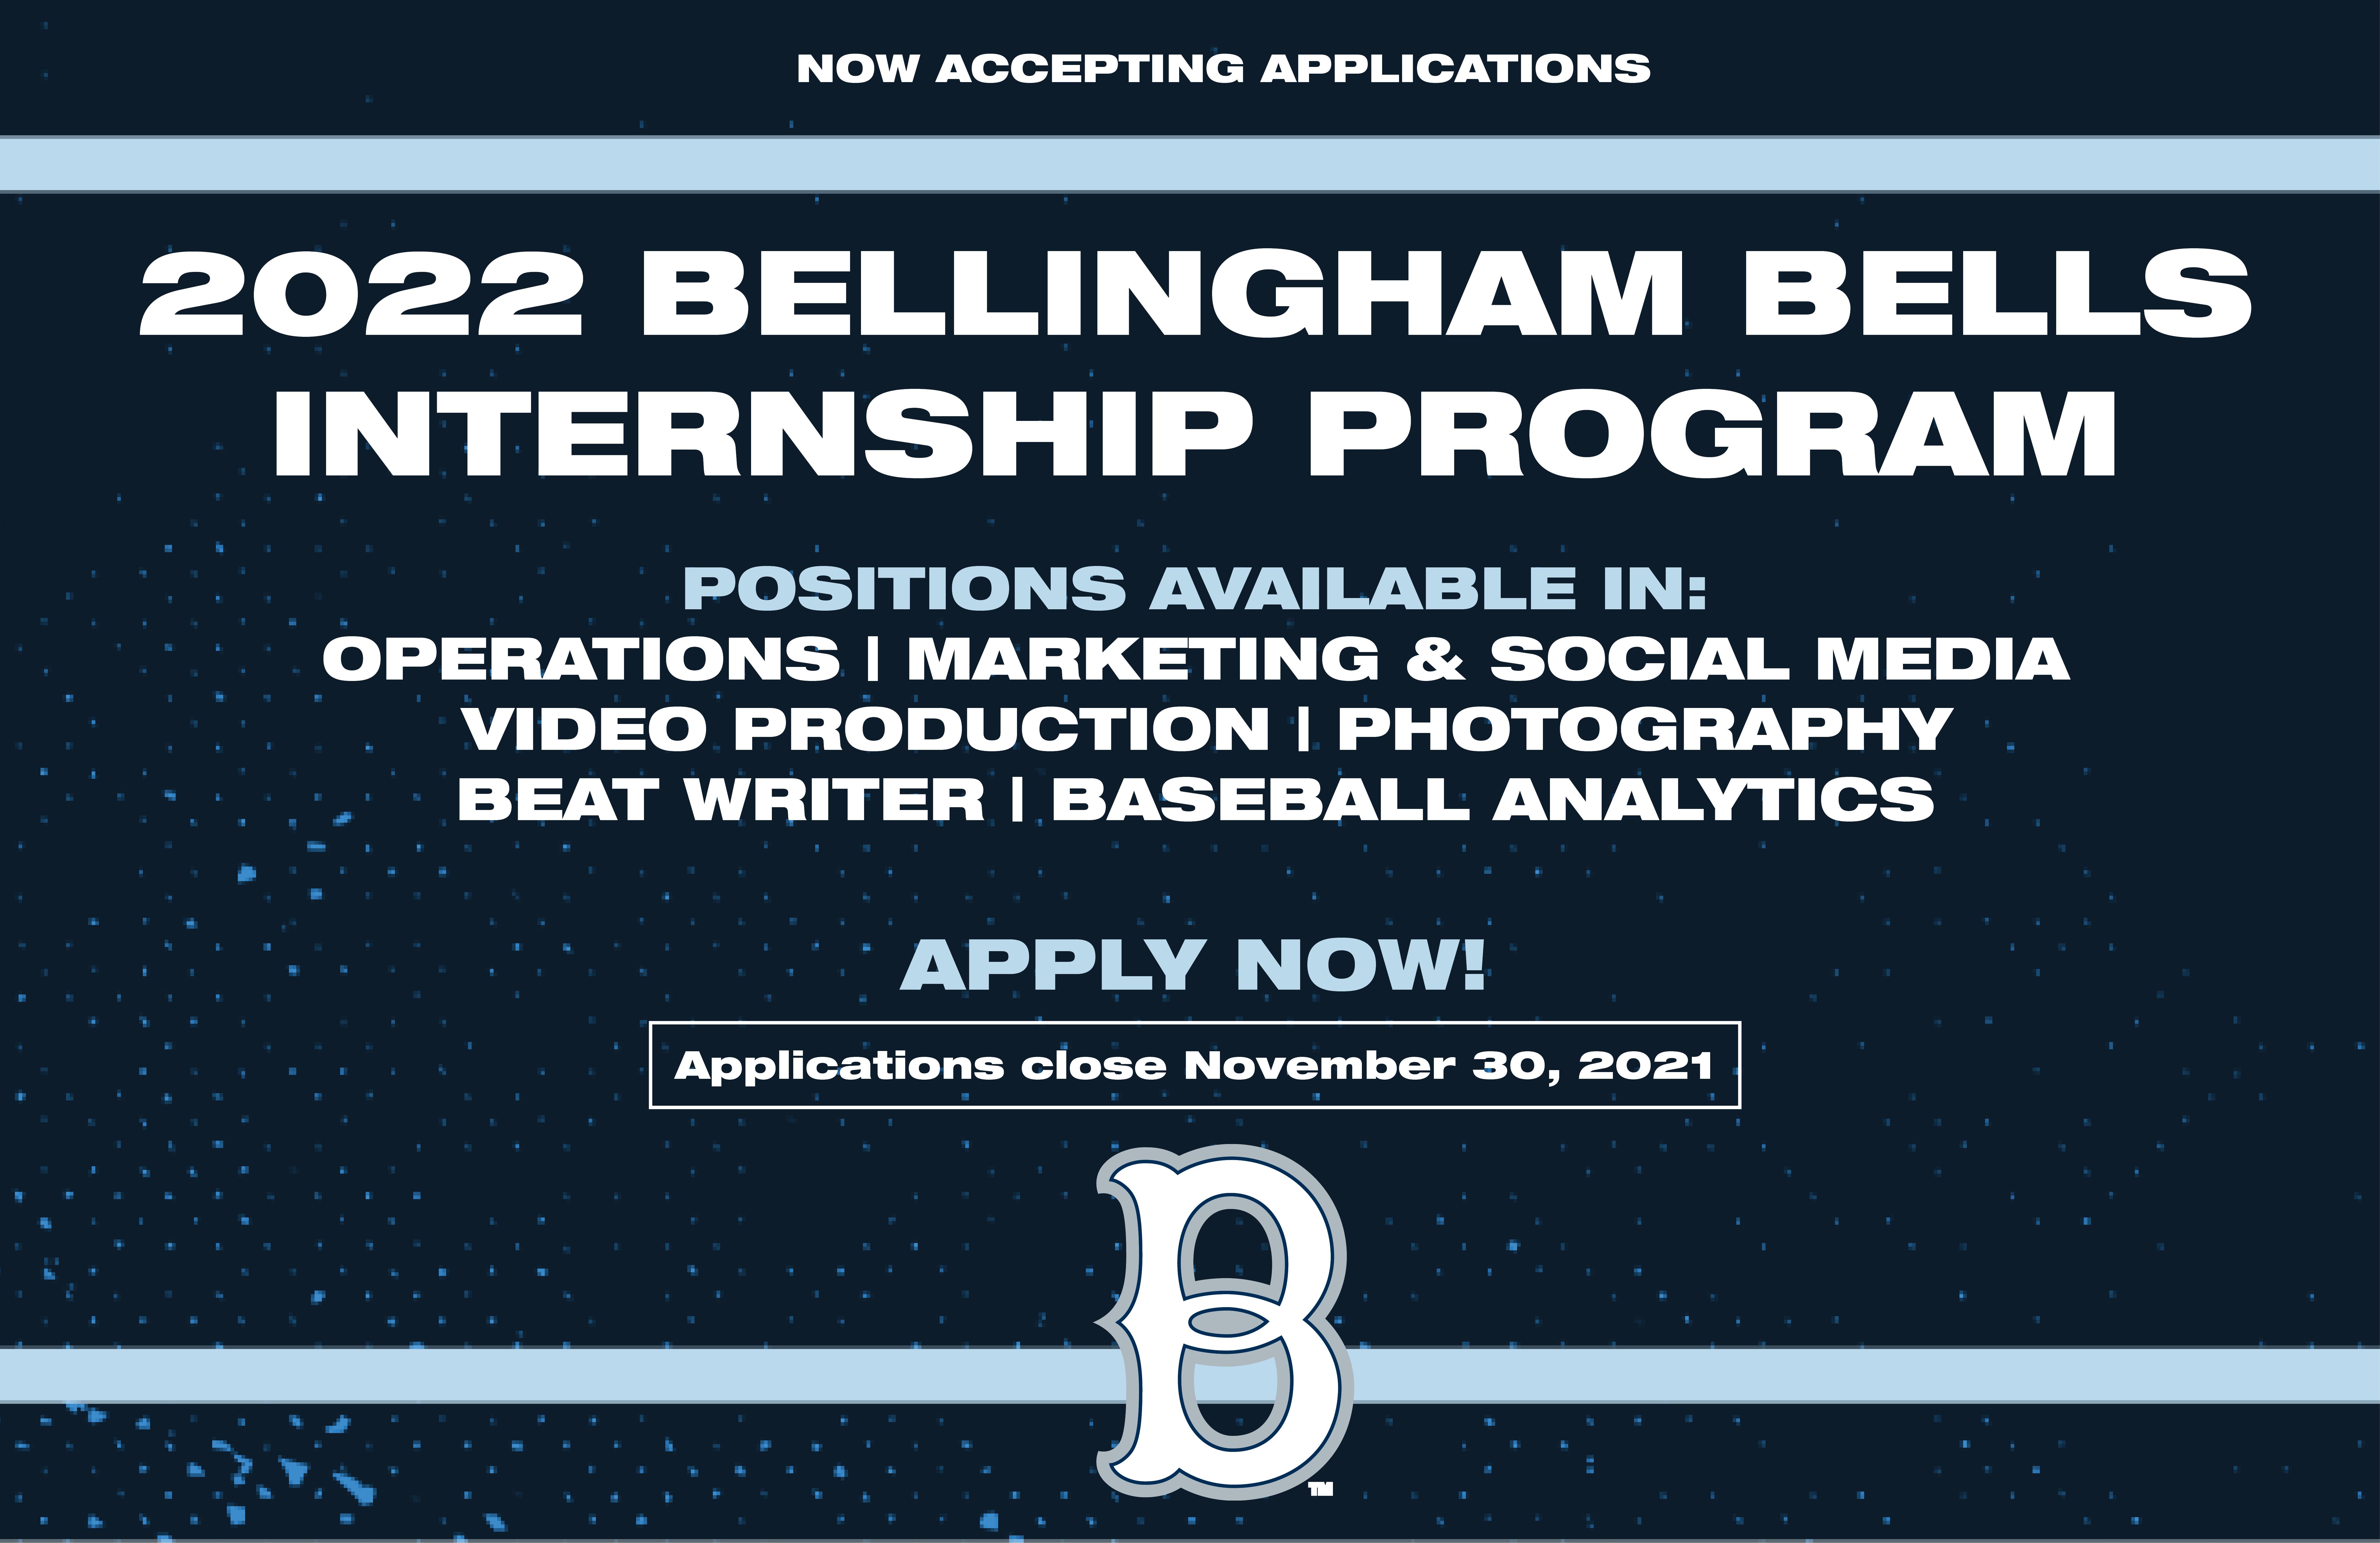 2022 Bellingham Bells Internships Available